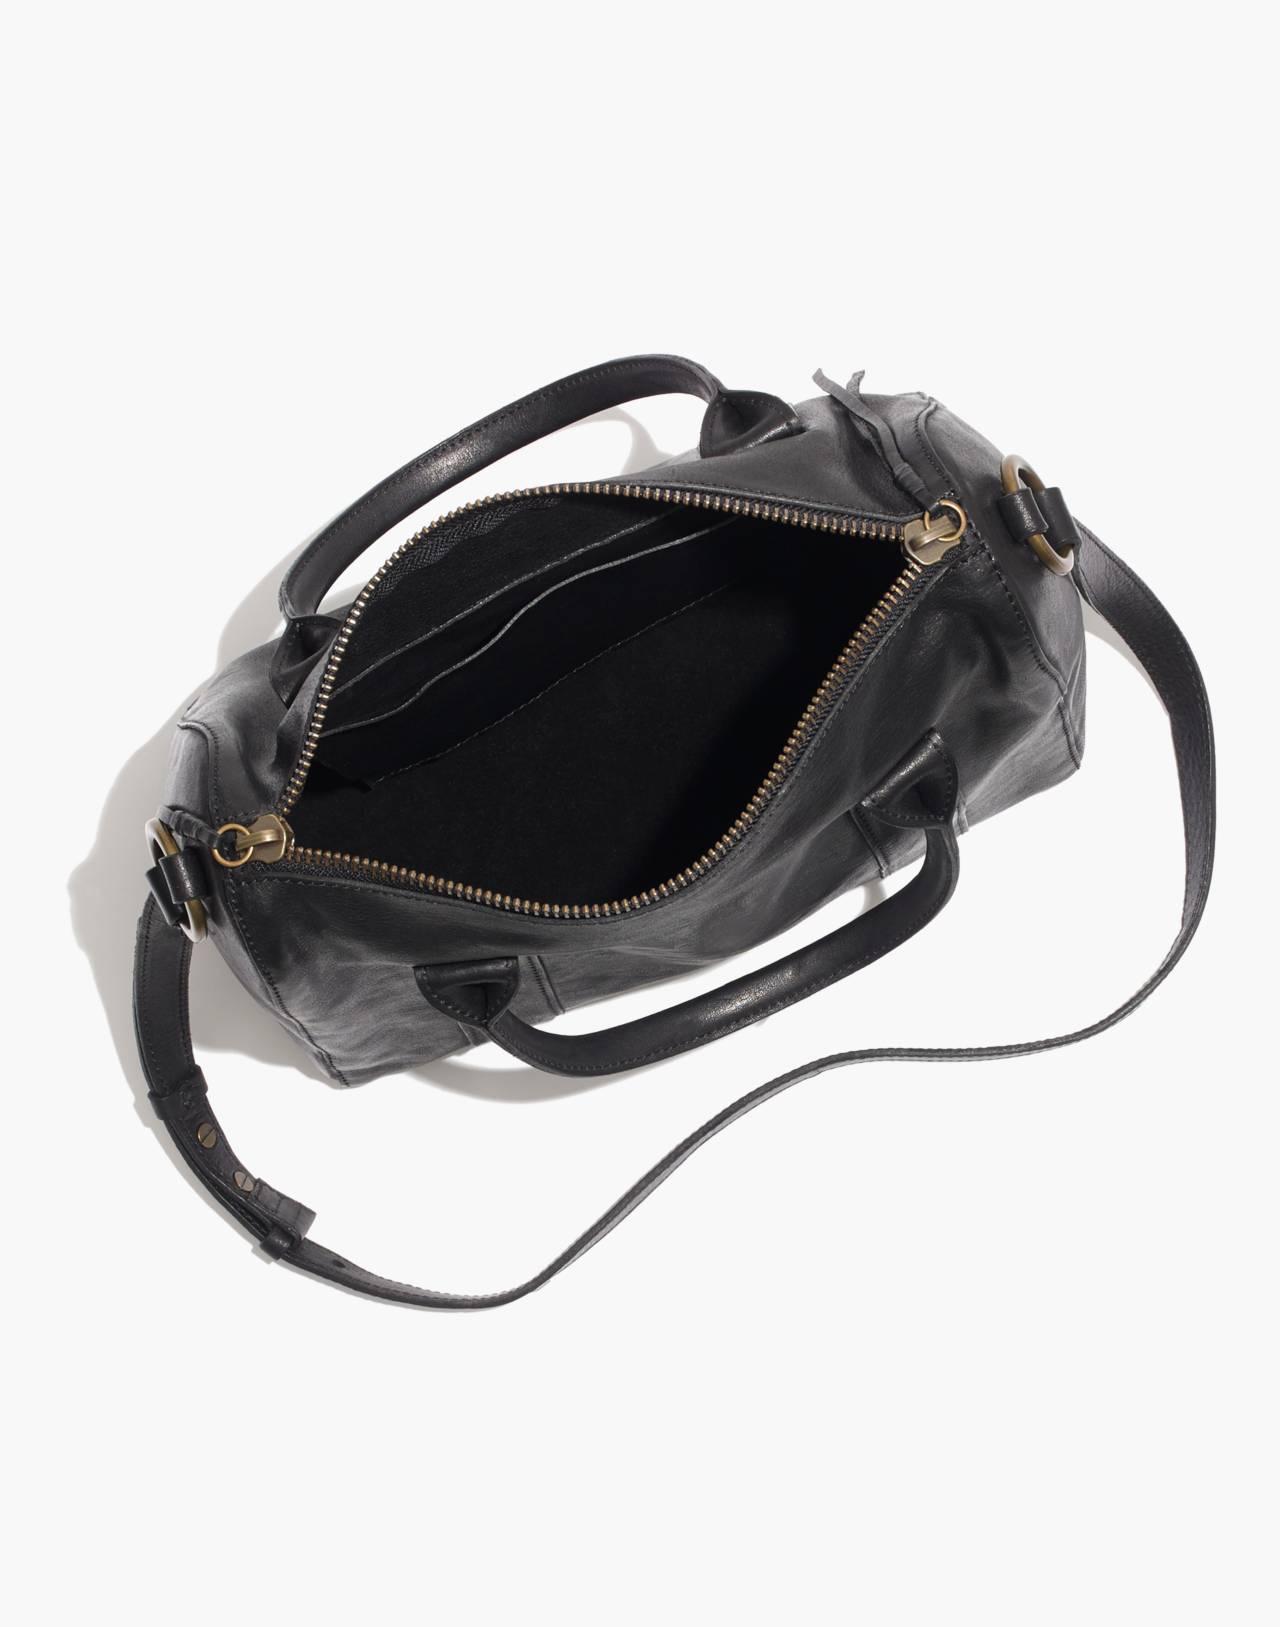 The Prague Satchel in true black image 2